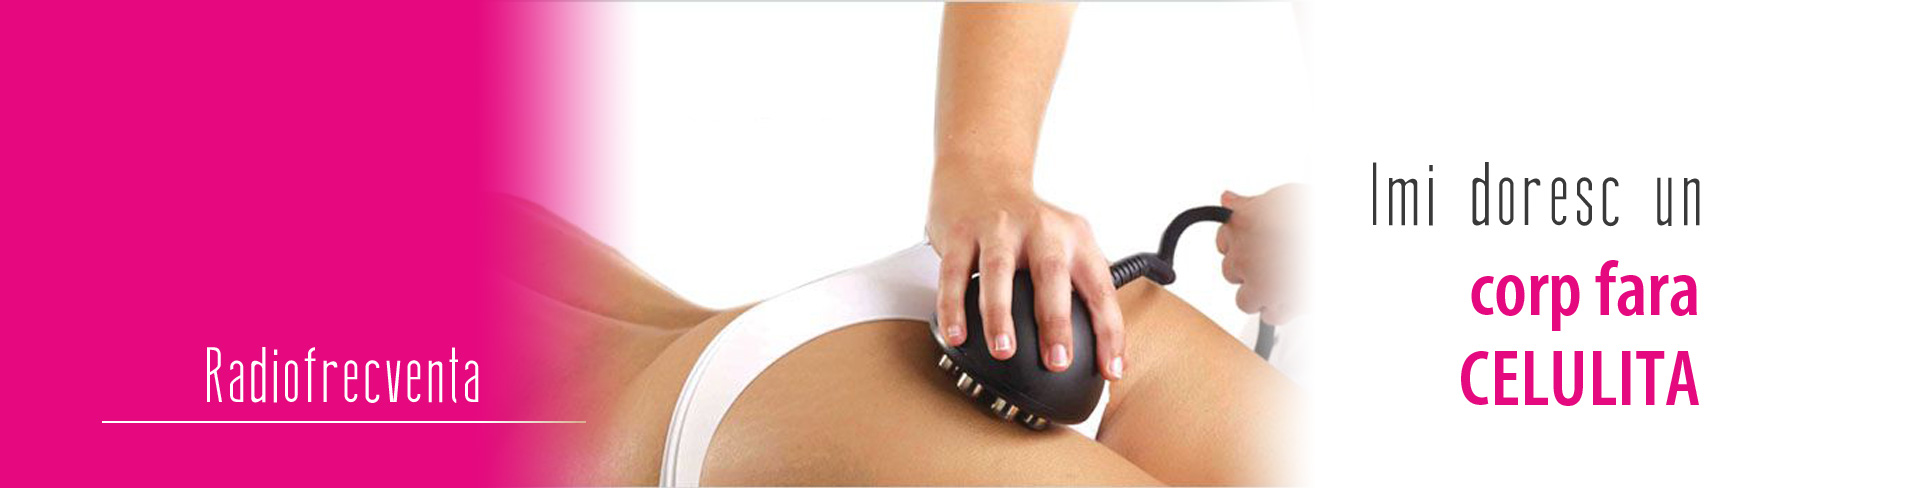 Pentru cine este indicata radiofrecventa corporala?